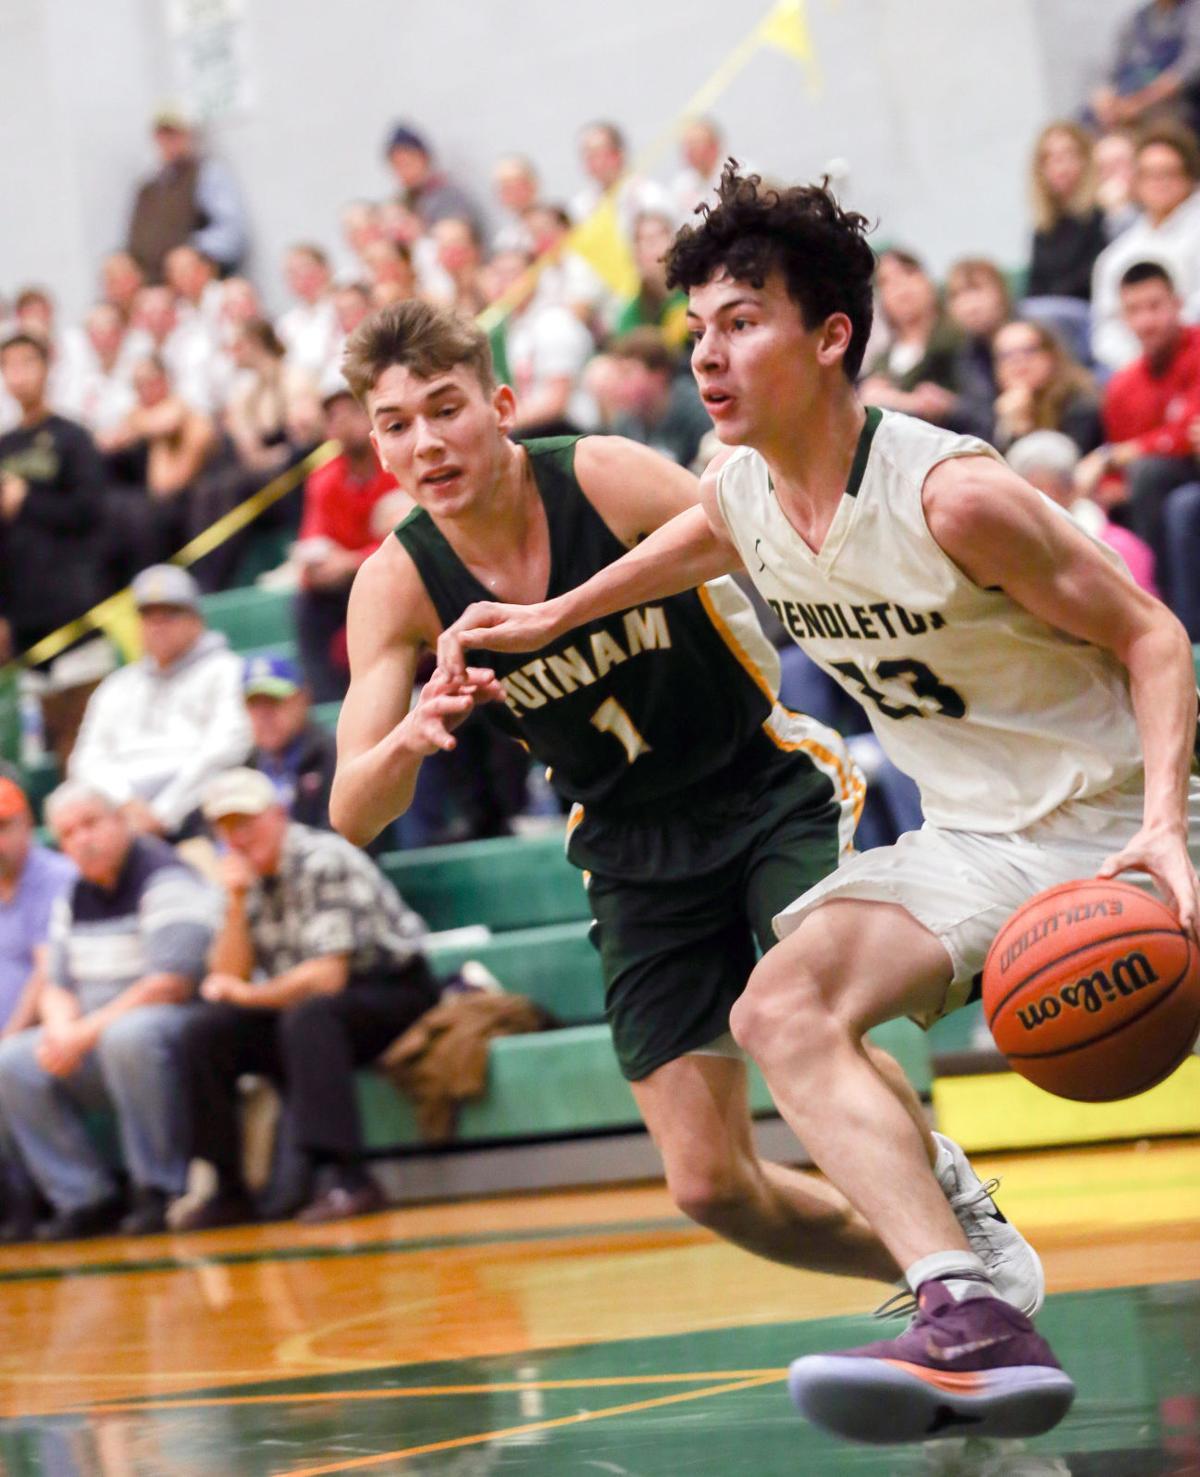 Pendleton basketball